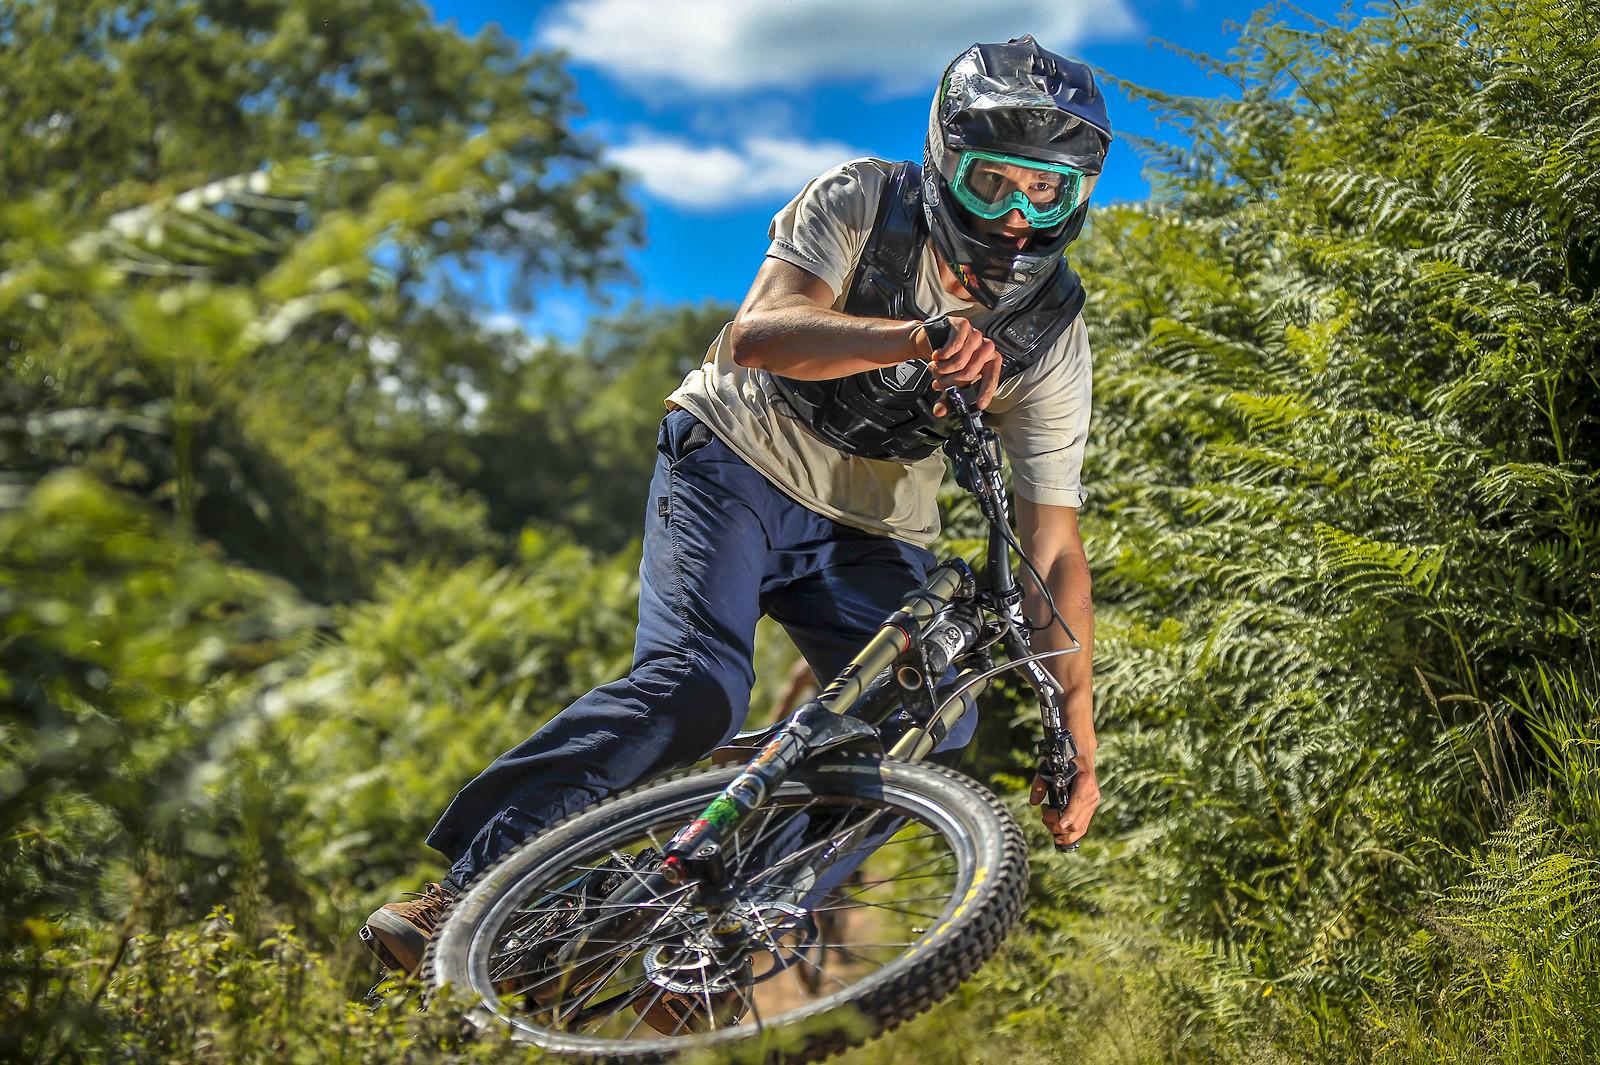 DSC5191 - robbarkerimages2017 - Mountain Biking Pictures - Vital MTB